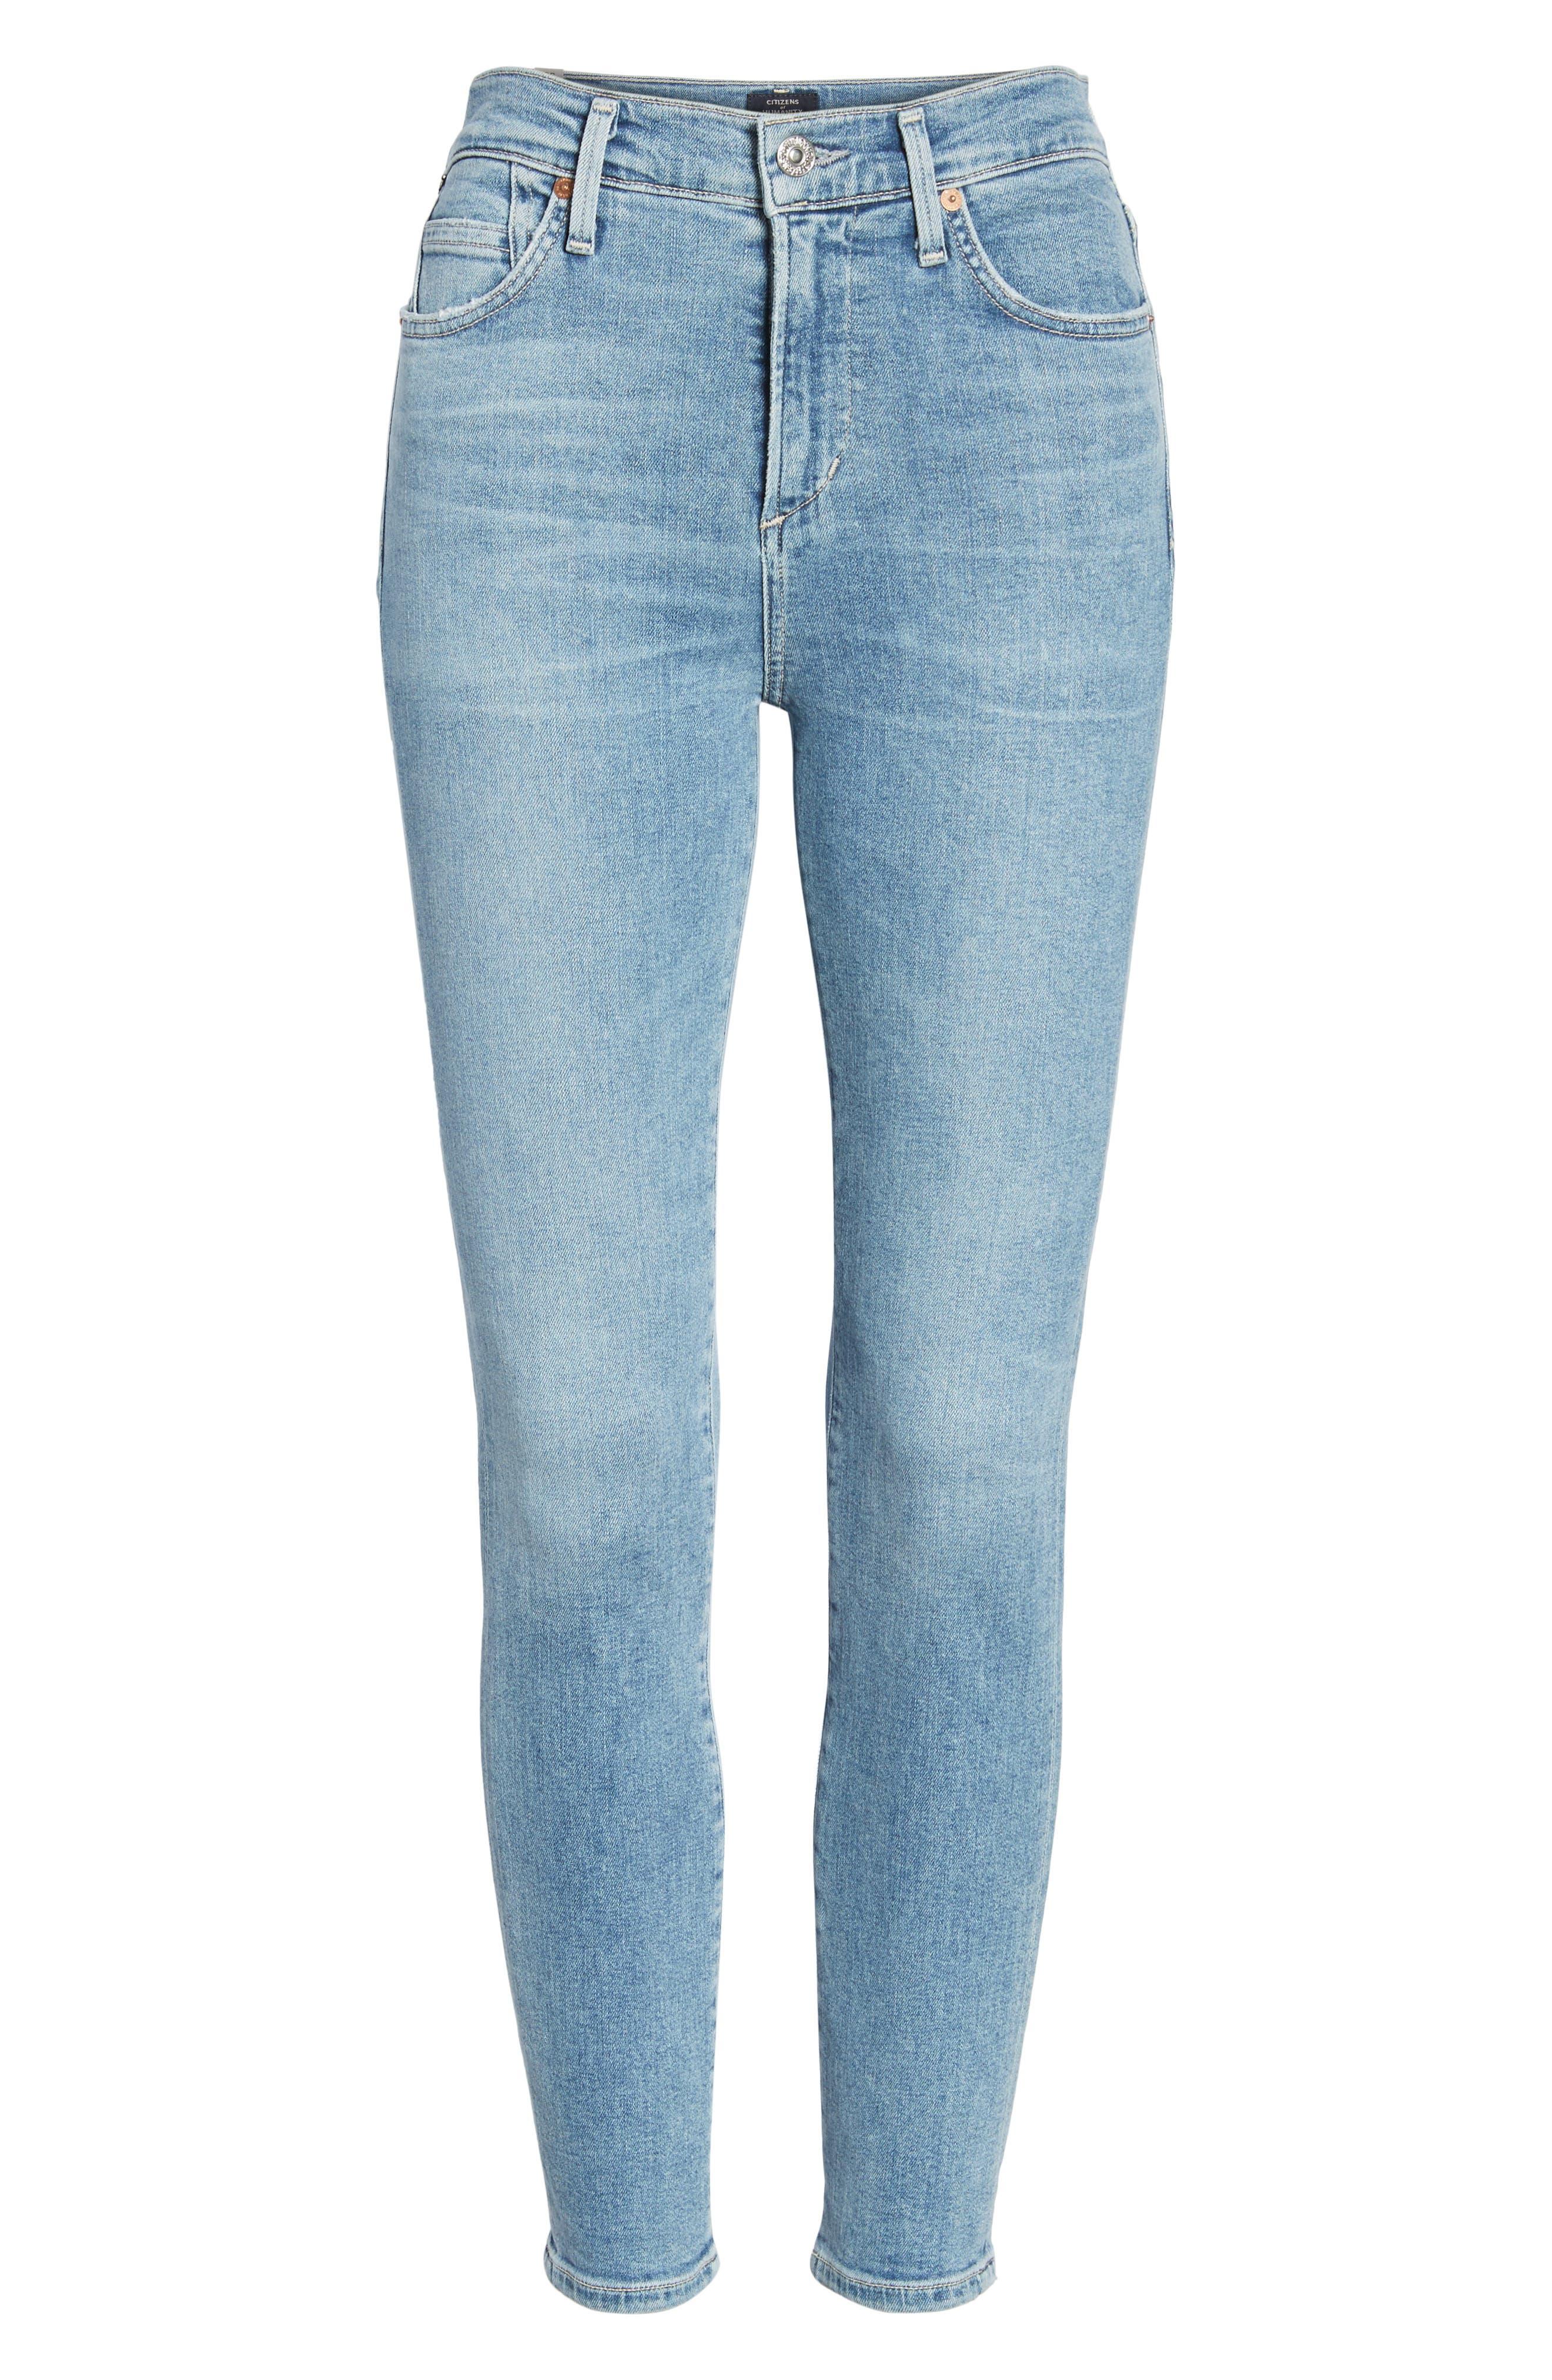 Rocket High Waist Crop Skinny Jeans,                             Alternate thumbnail 7, color,                             Firestone